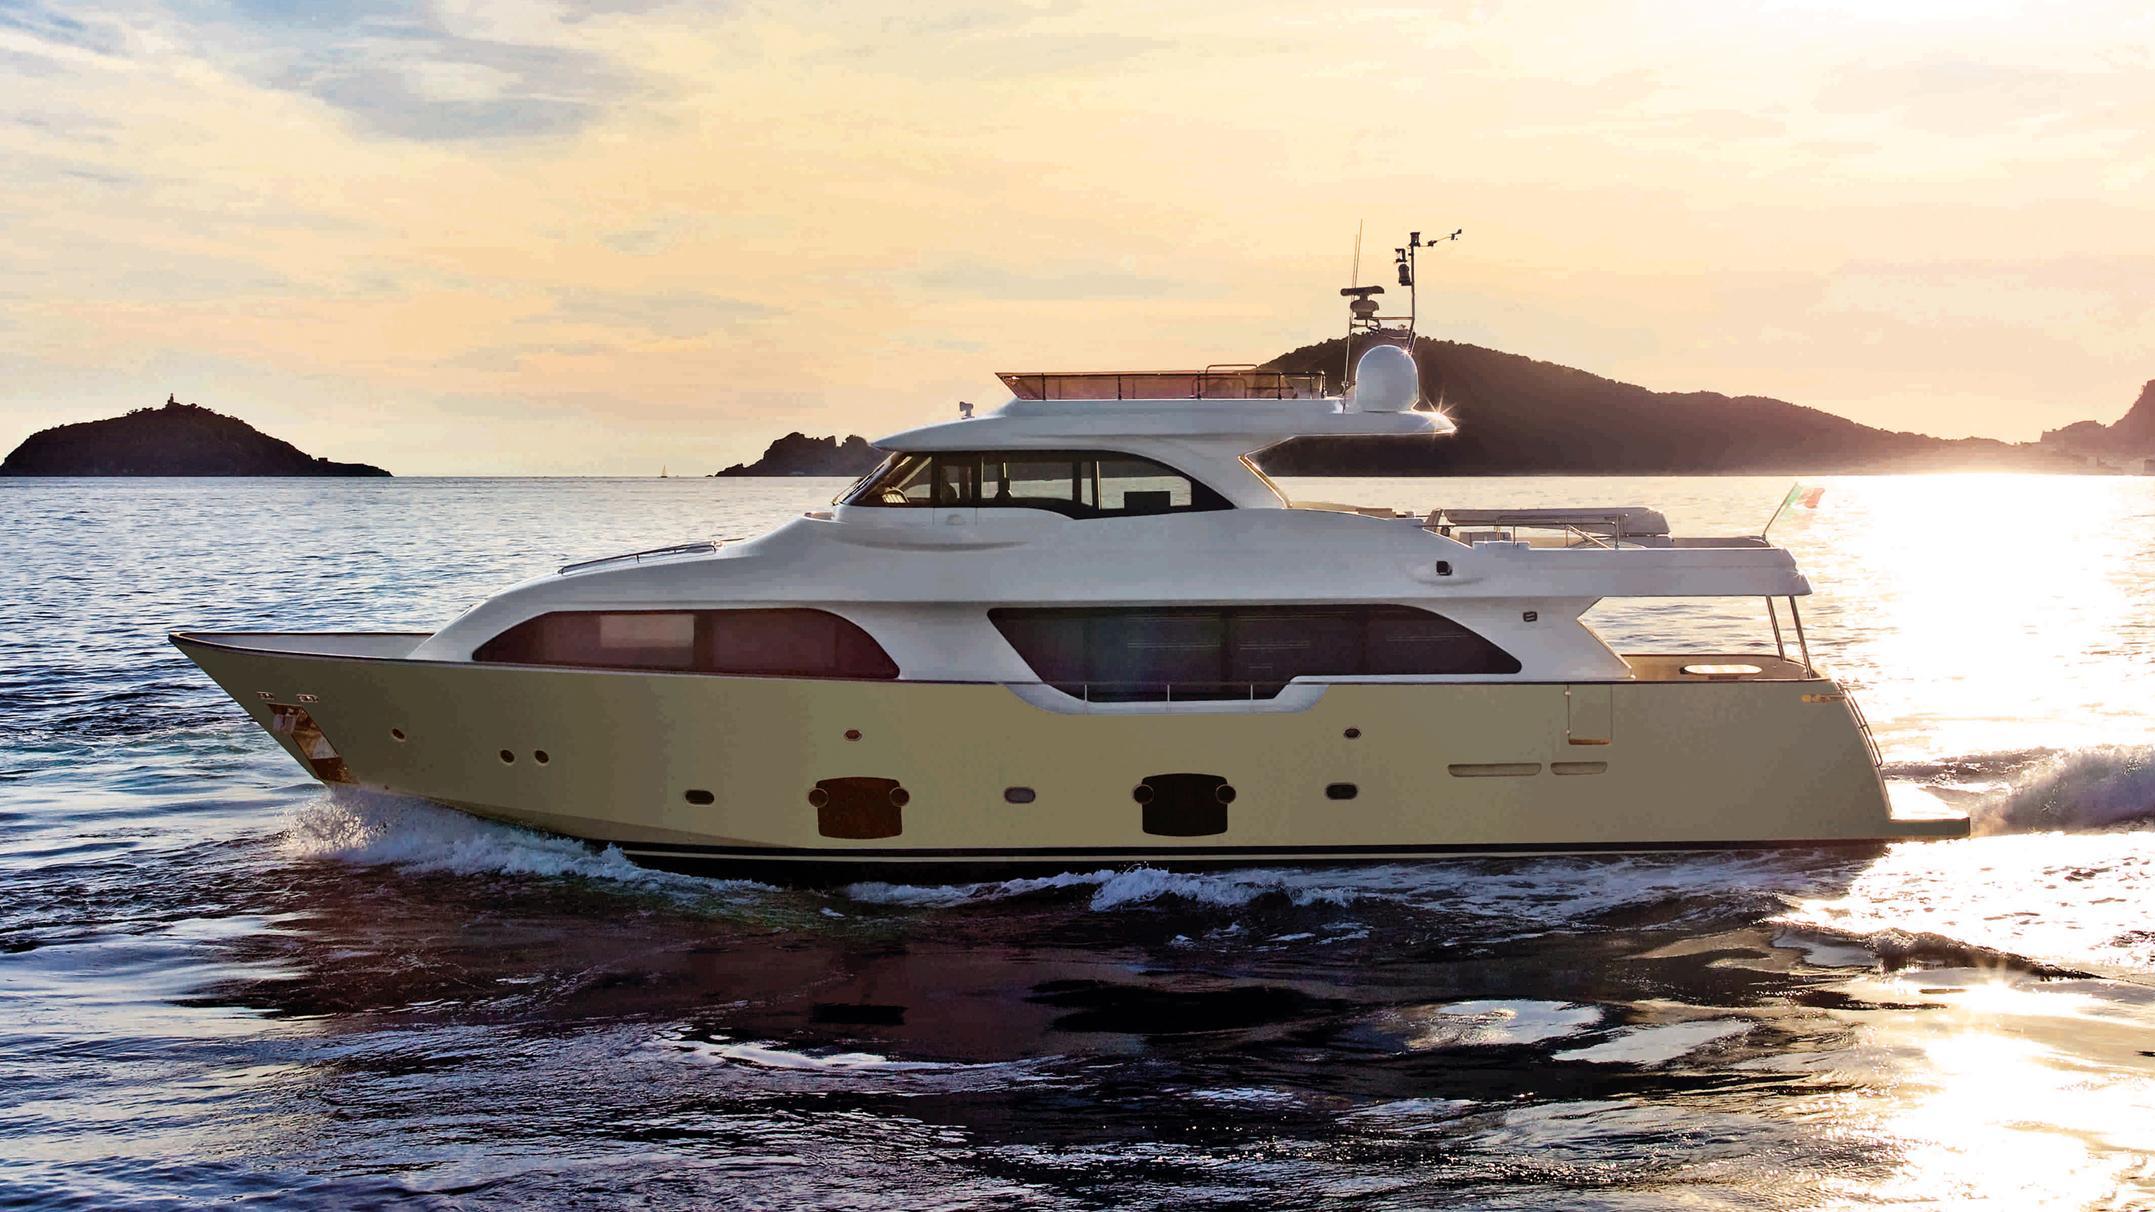 navetta-26c-15-motor-yacht-ferretti-custom-line-2012-profile